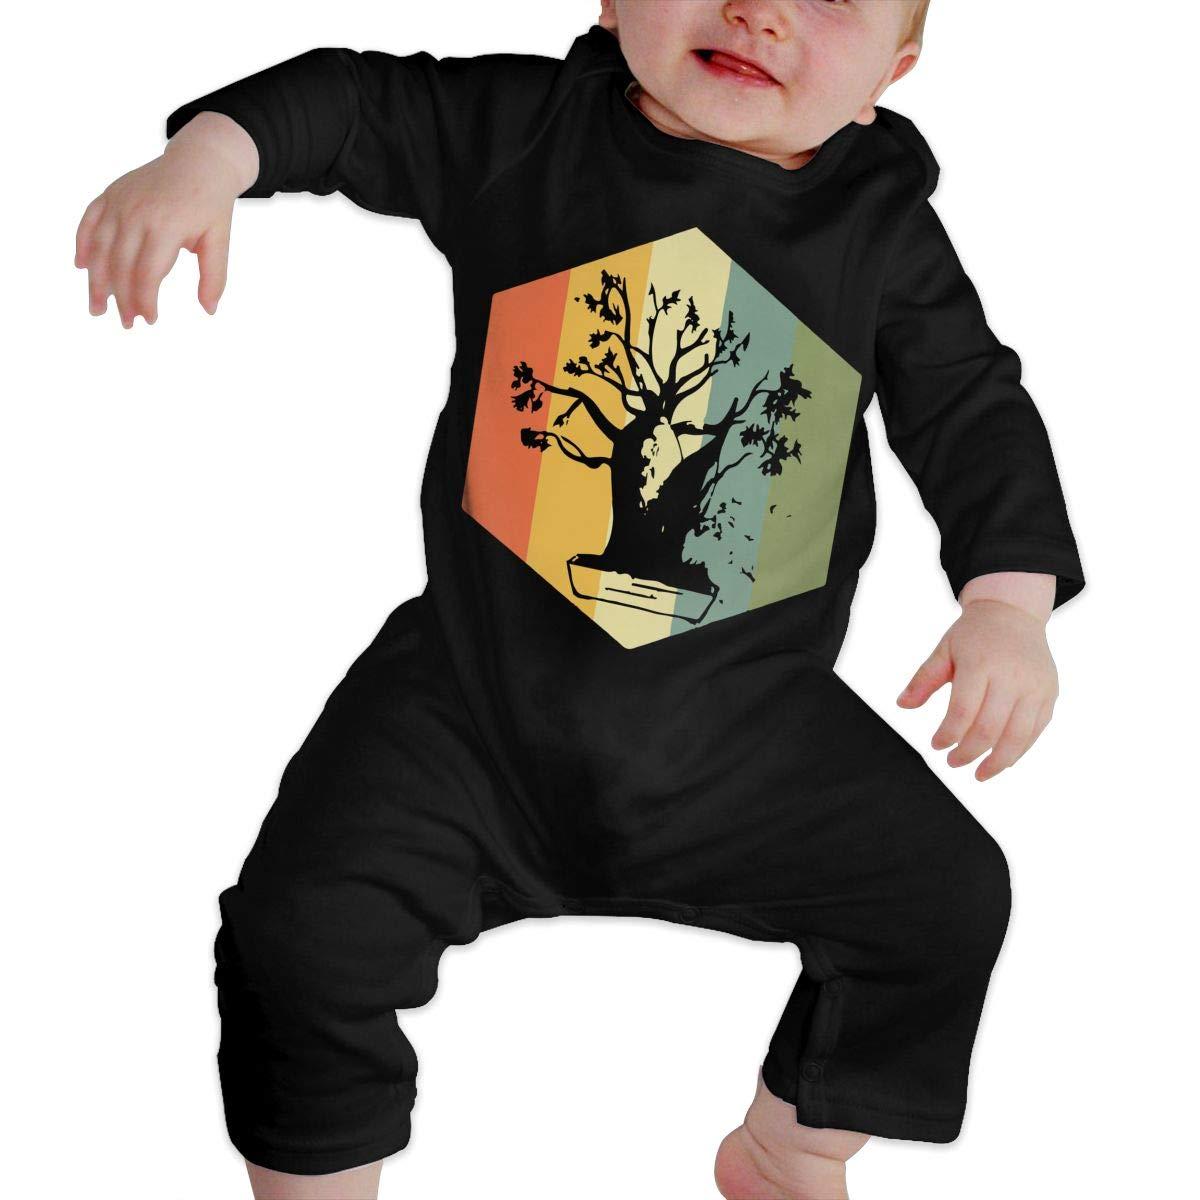 UGFGF-S3 Retro Bonsai Baby Boy Girl Long Sleeve Bodysuit Coverall